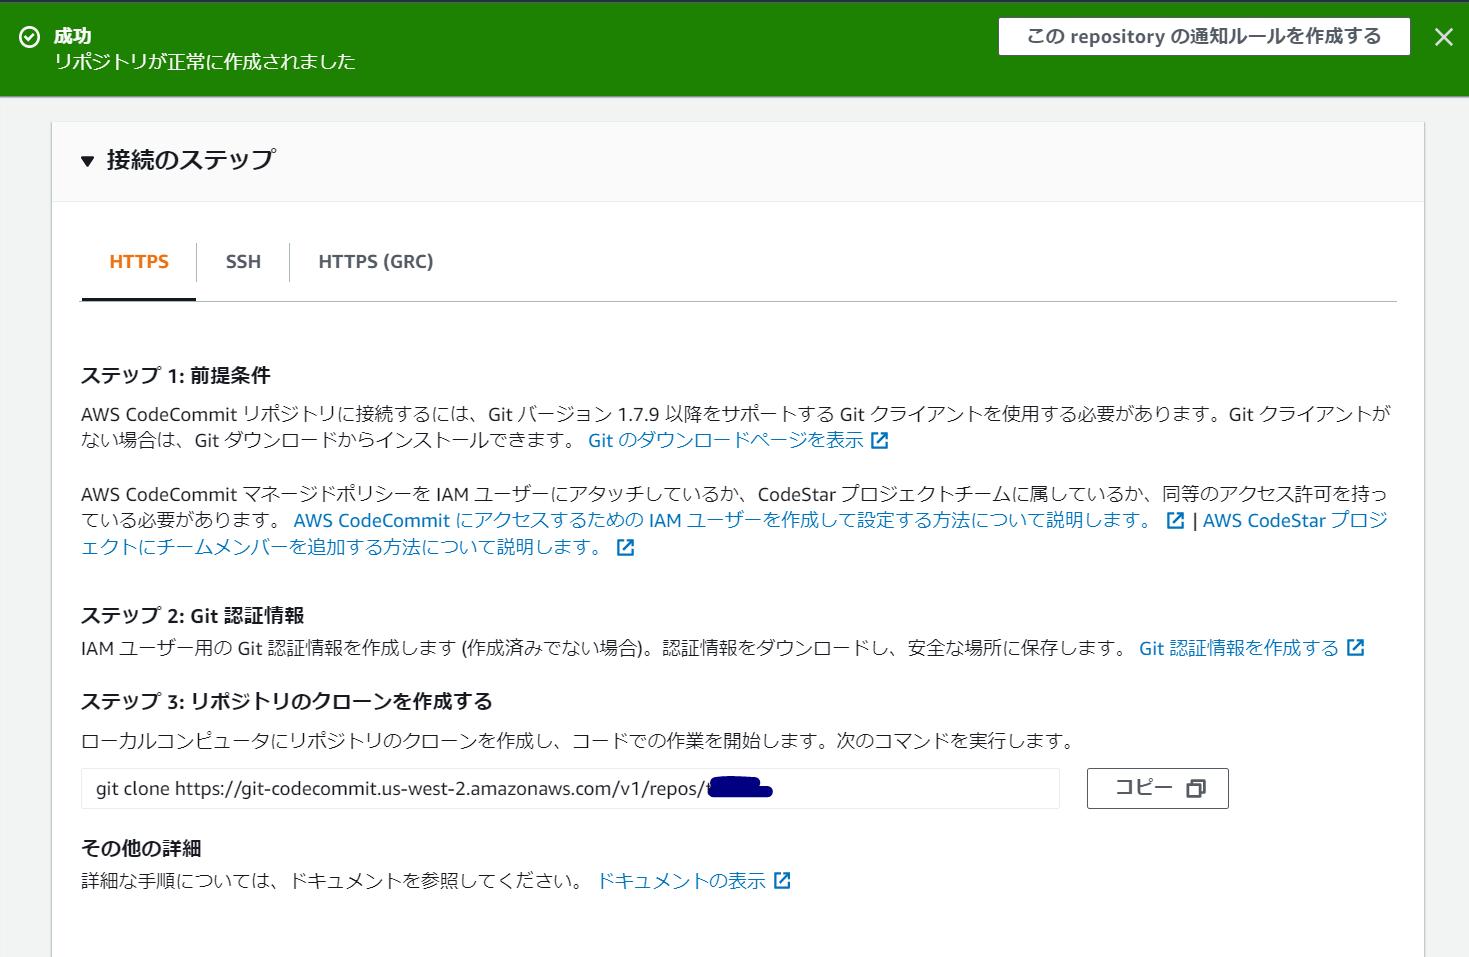 Git リモート リポジトリ 作成